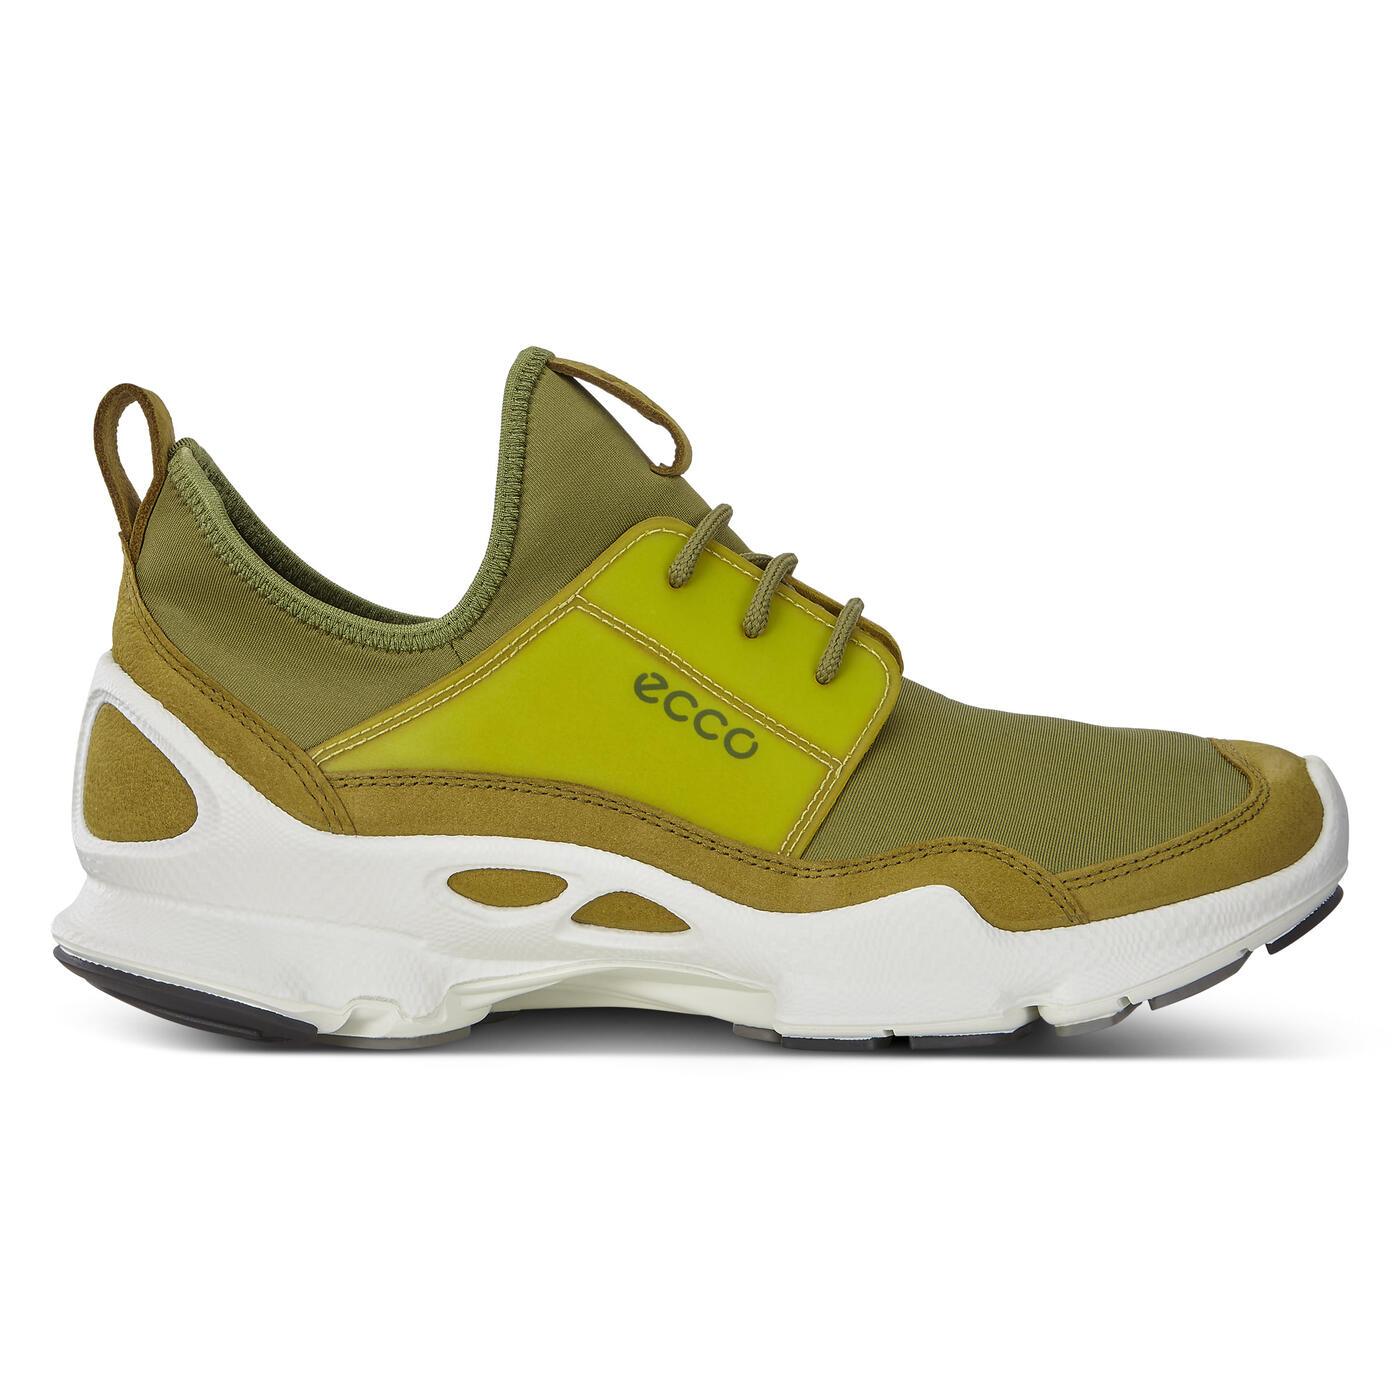 ECCO BIOM C - MENS Shoe